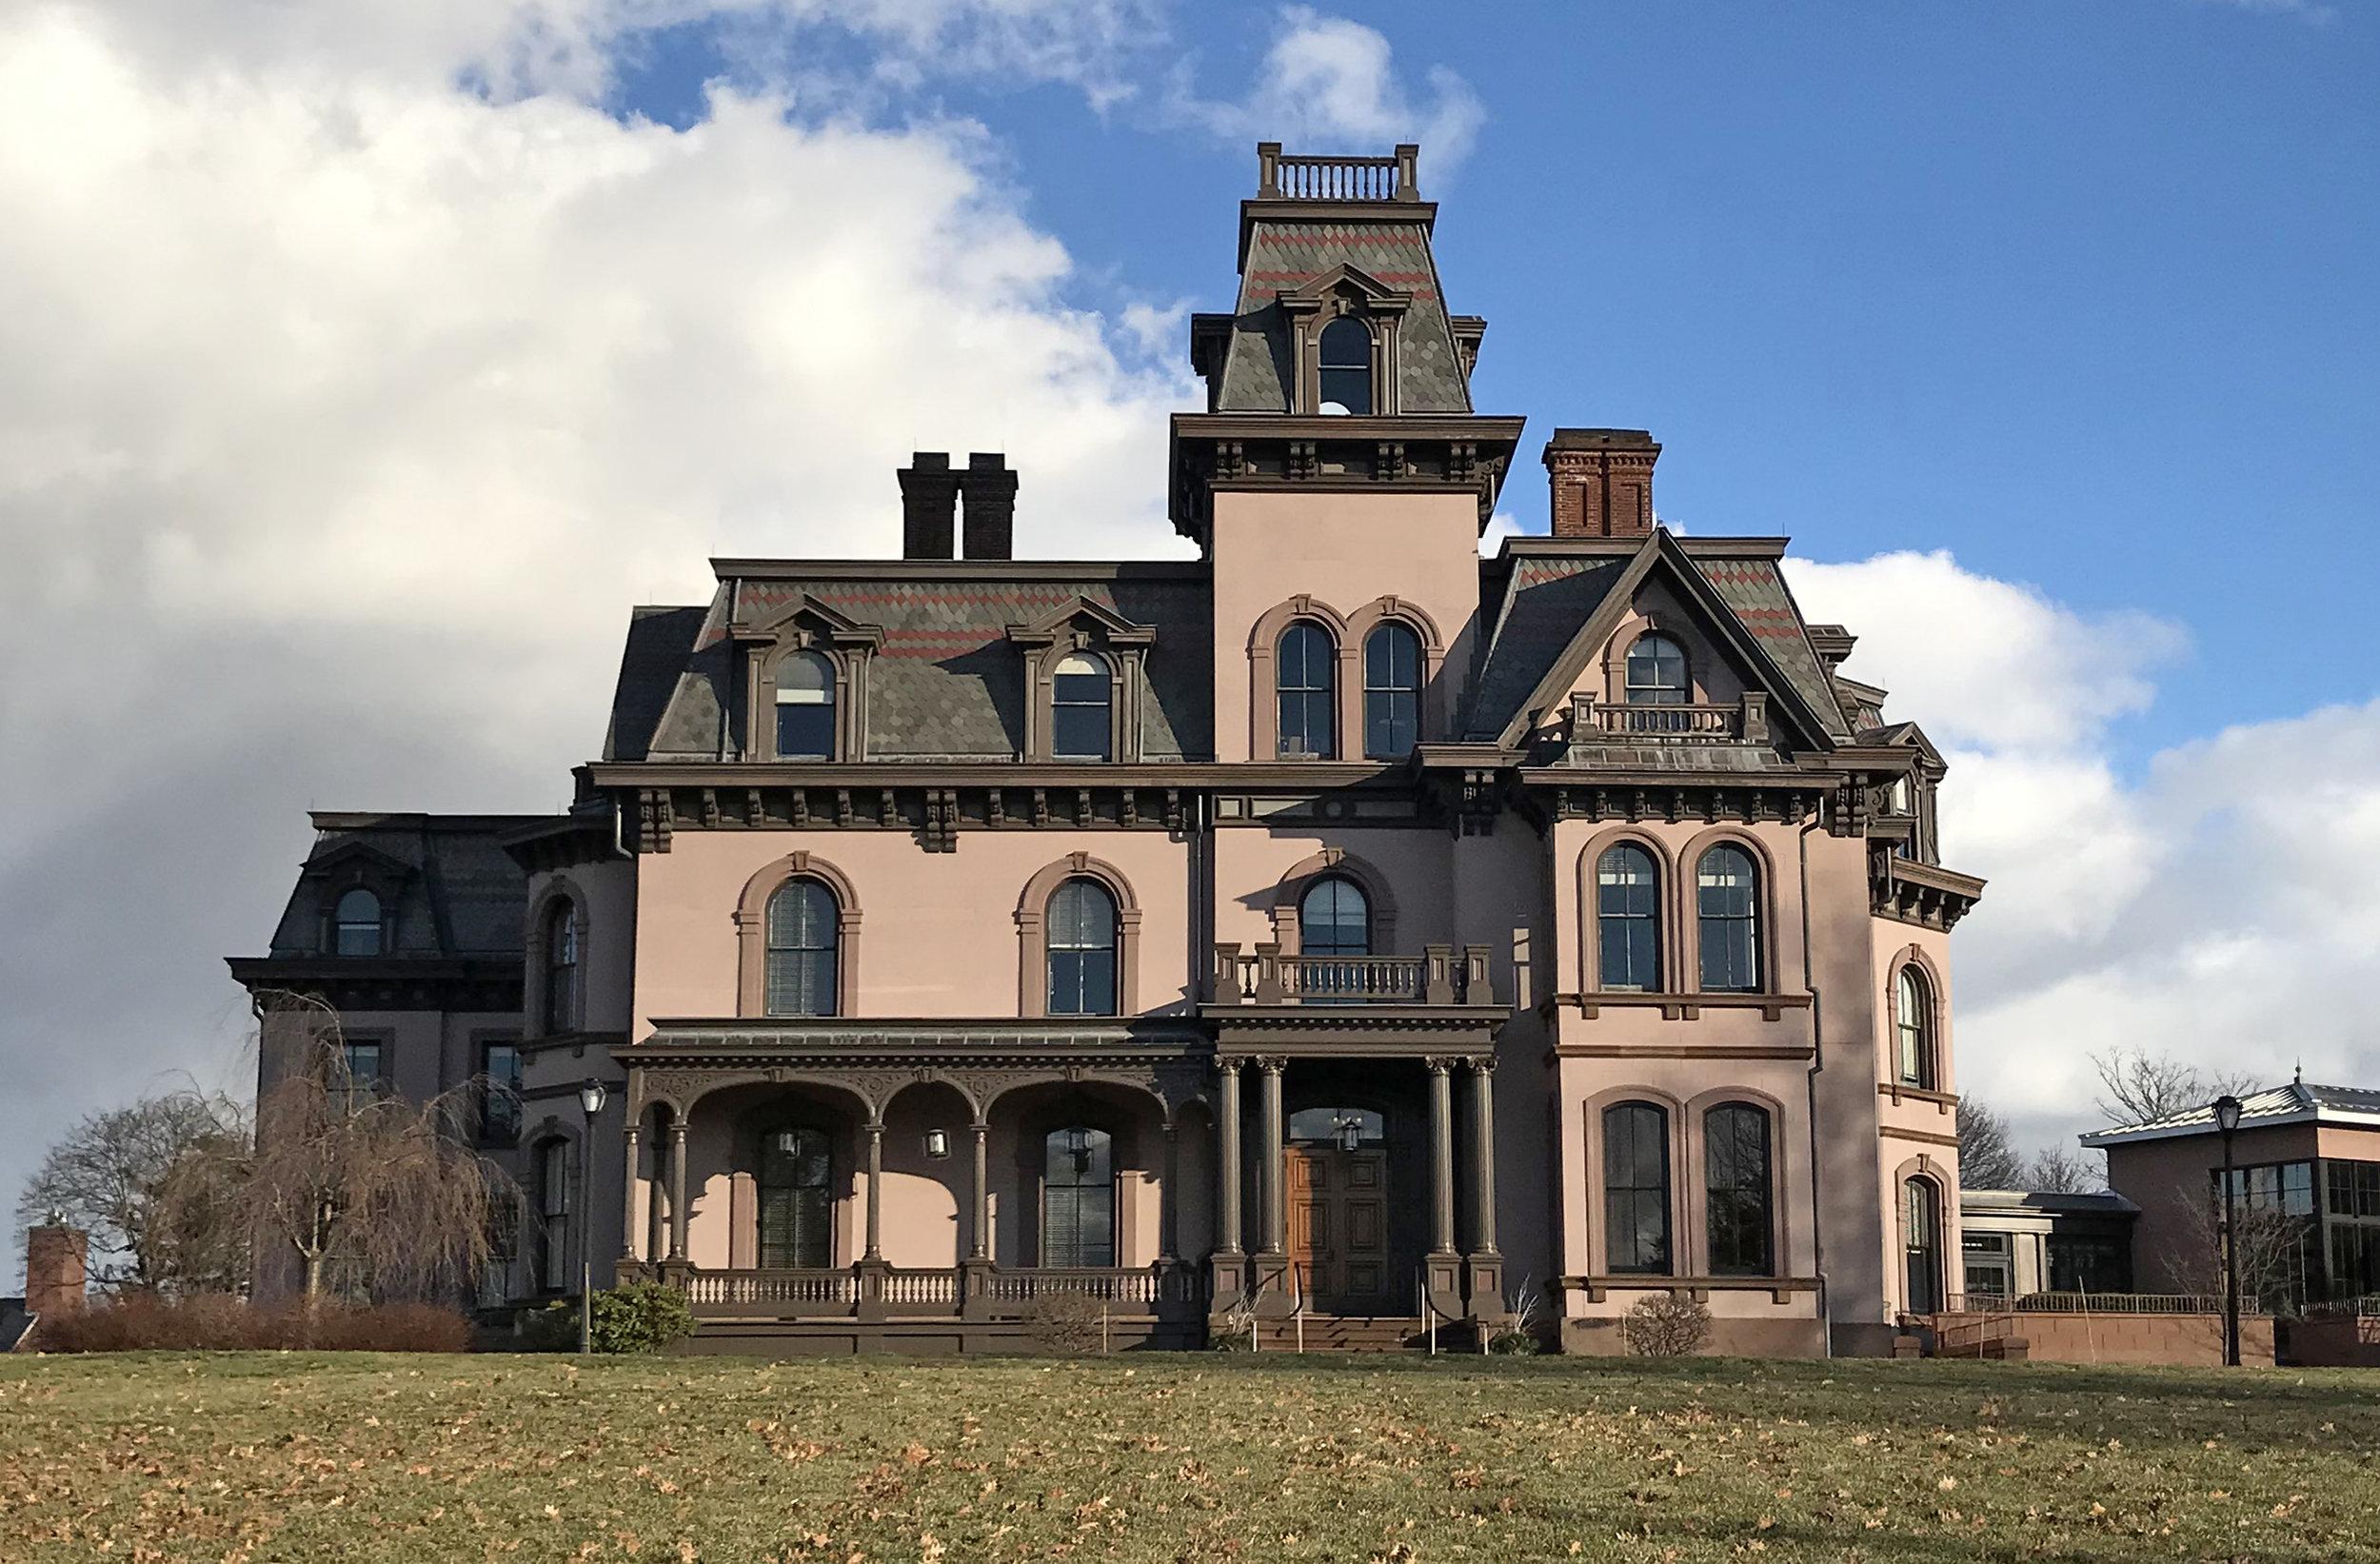 John Davies Mansion, 393 Prospect Street. Architects: Henry Austin and David R. Brown, 1868.